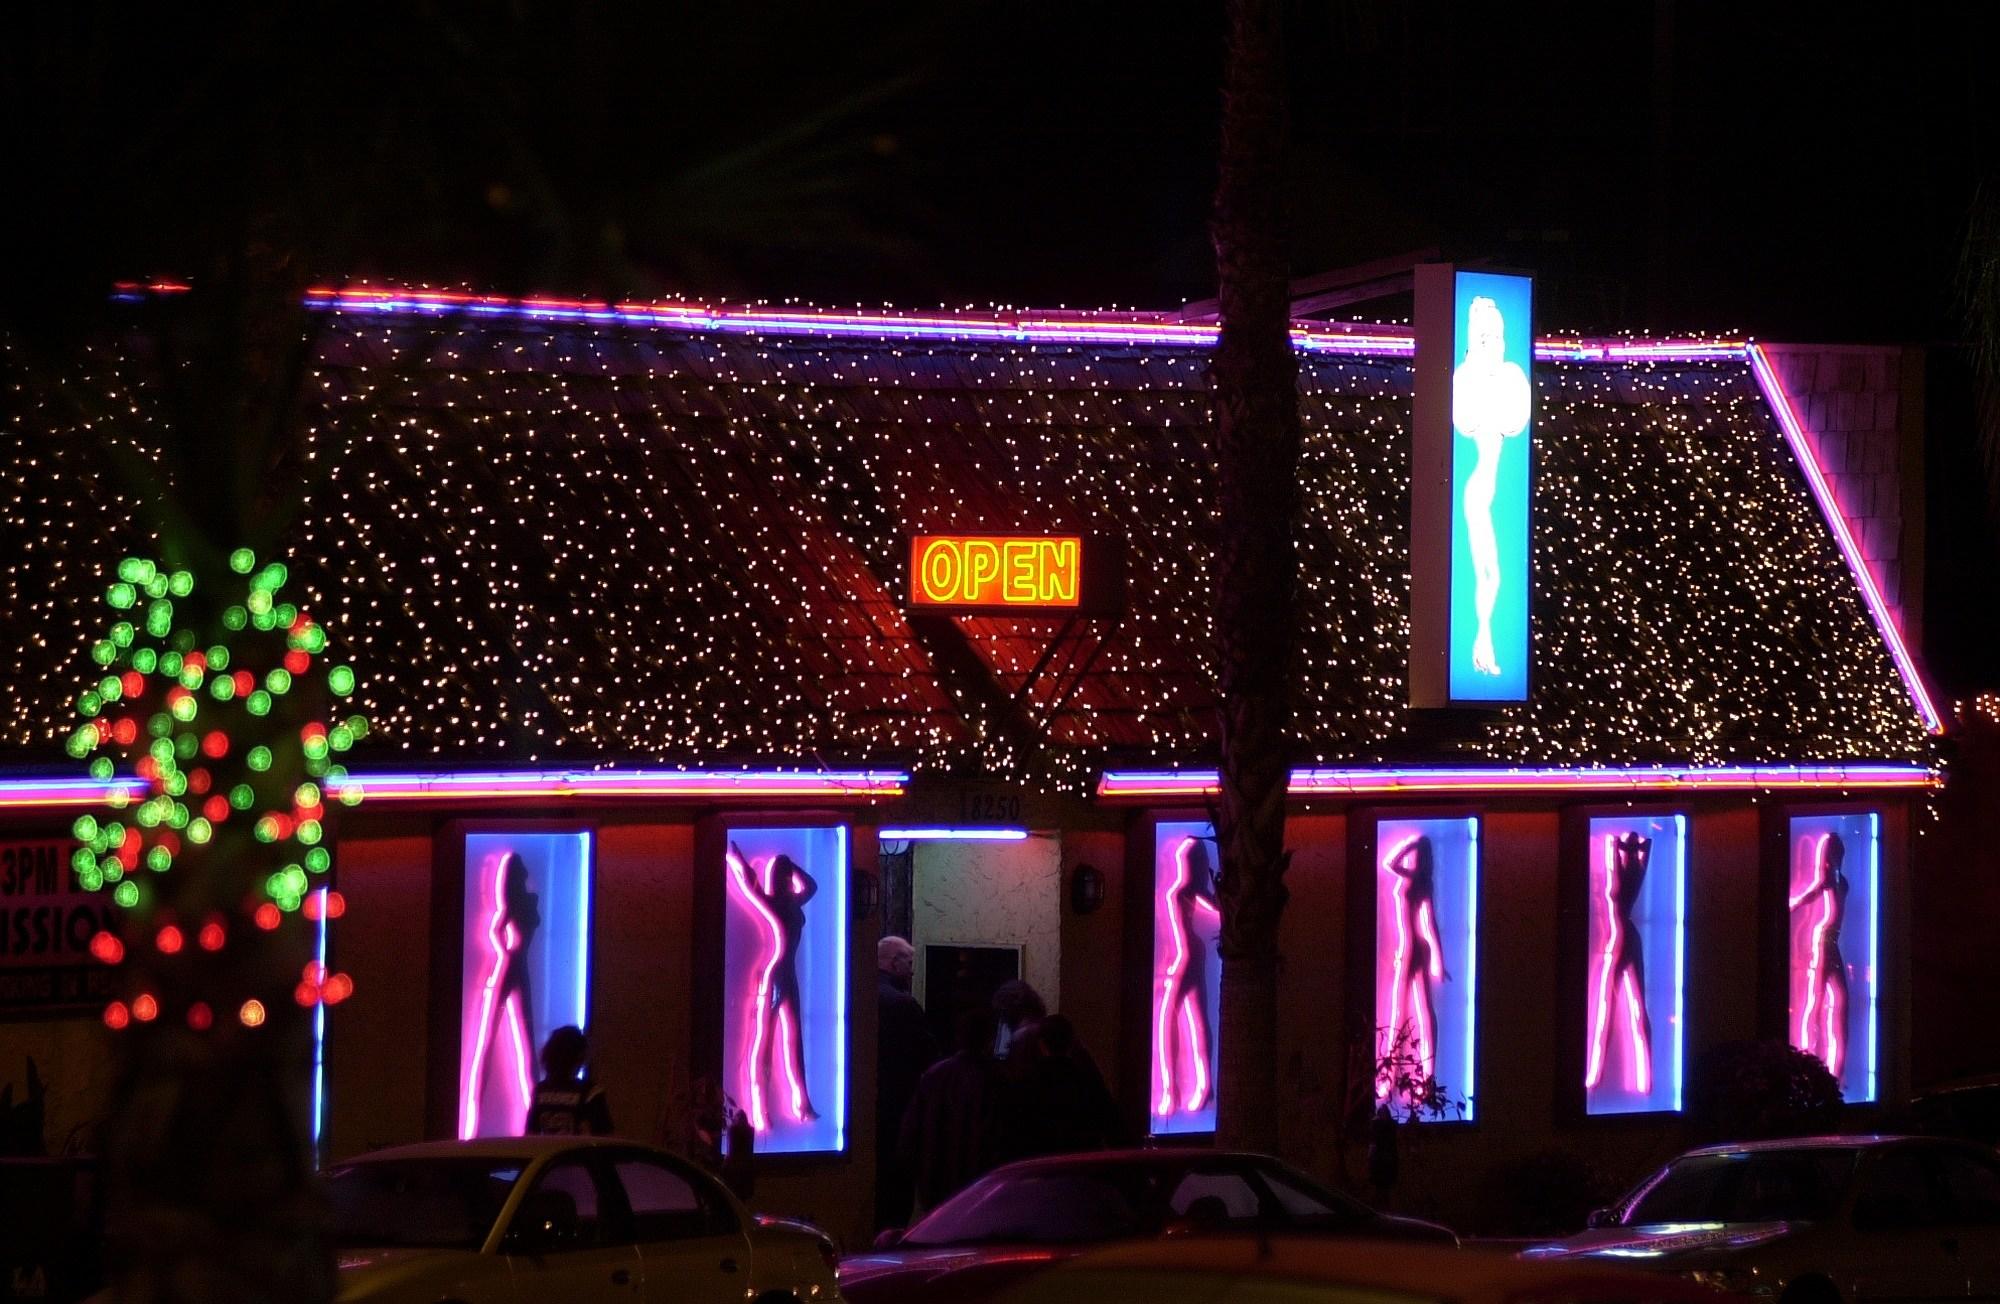 Opinion you totally nude strip clubs states theme